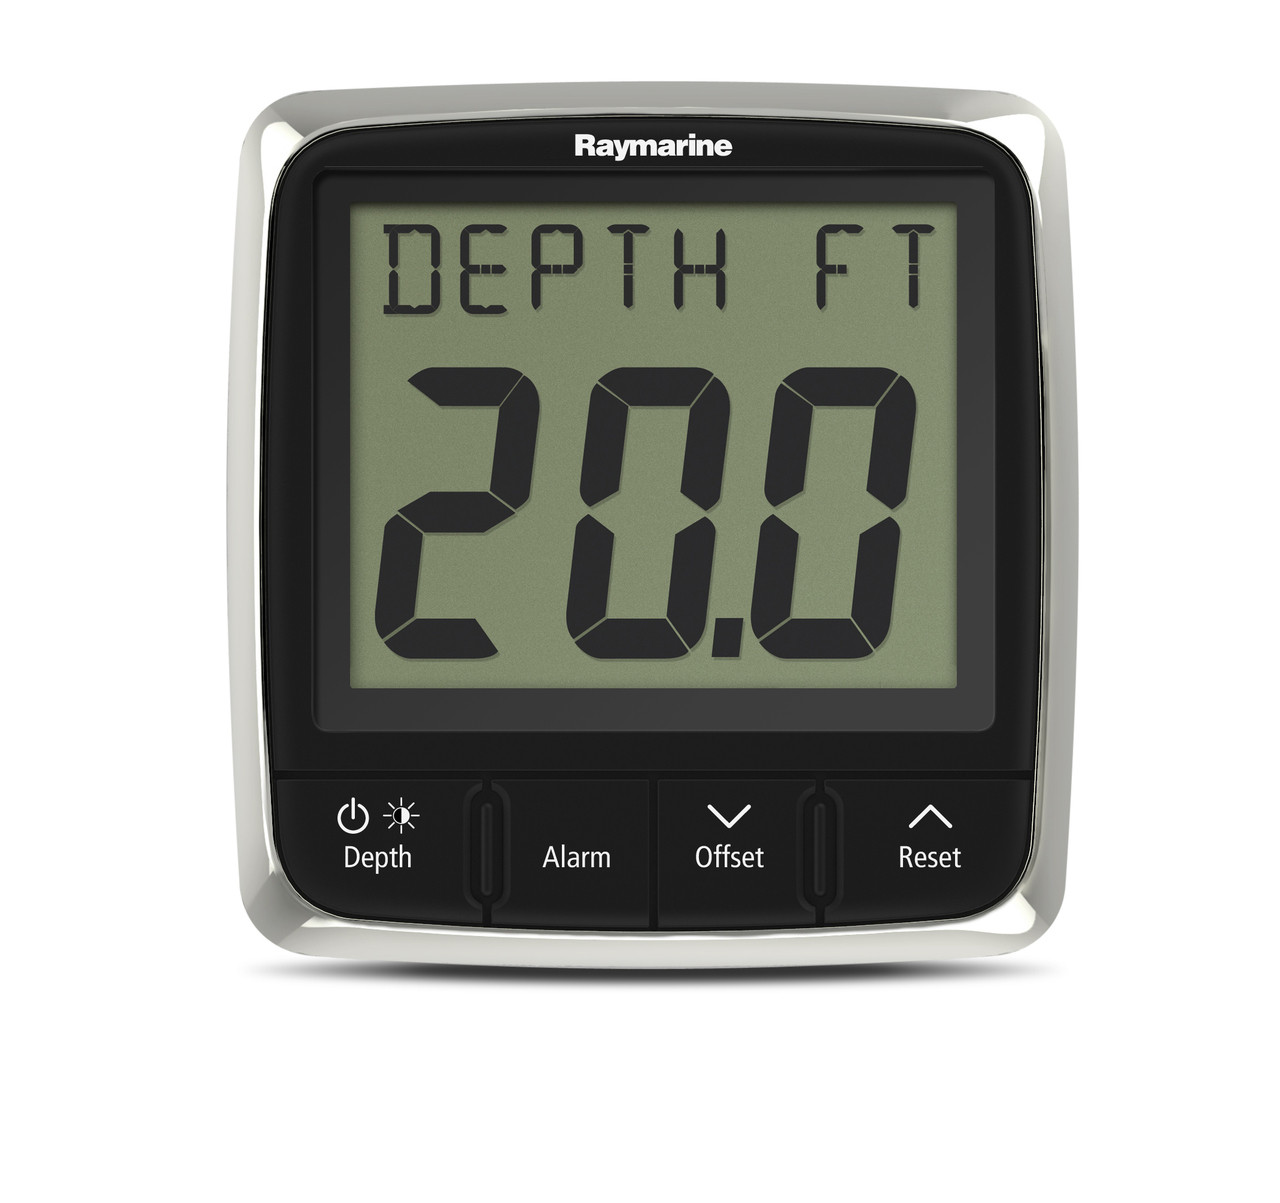 Raymarine i50 Depth Instrument Display Front View